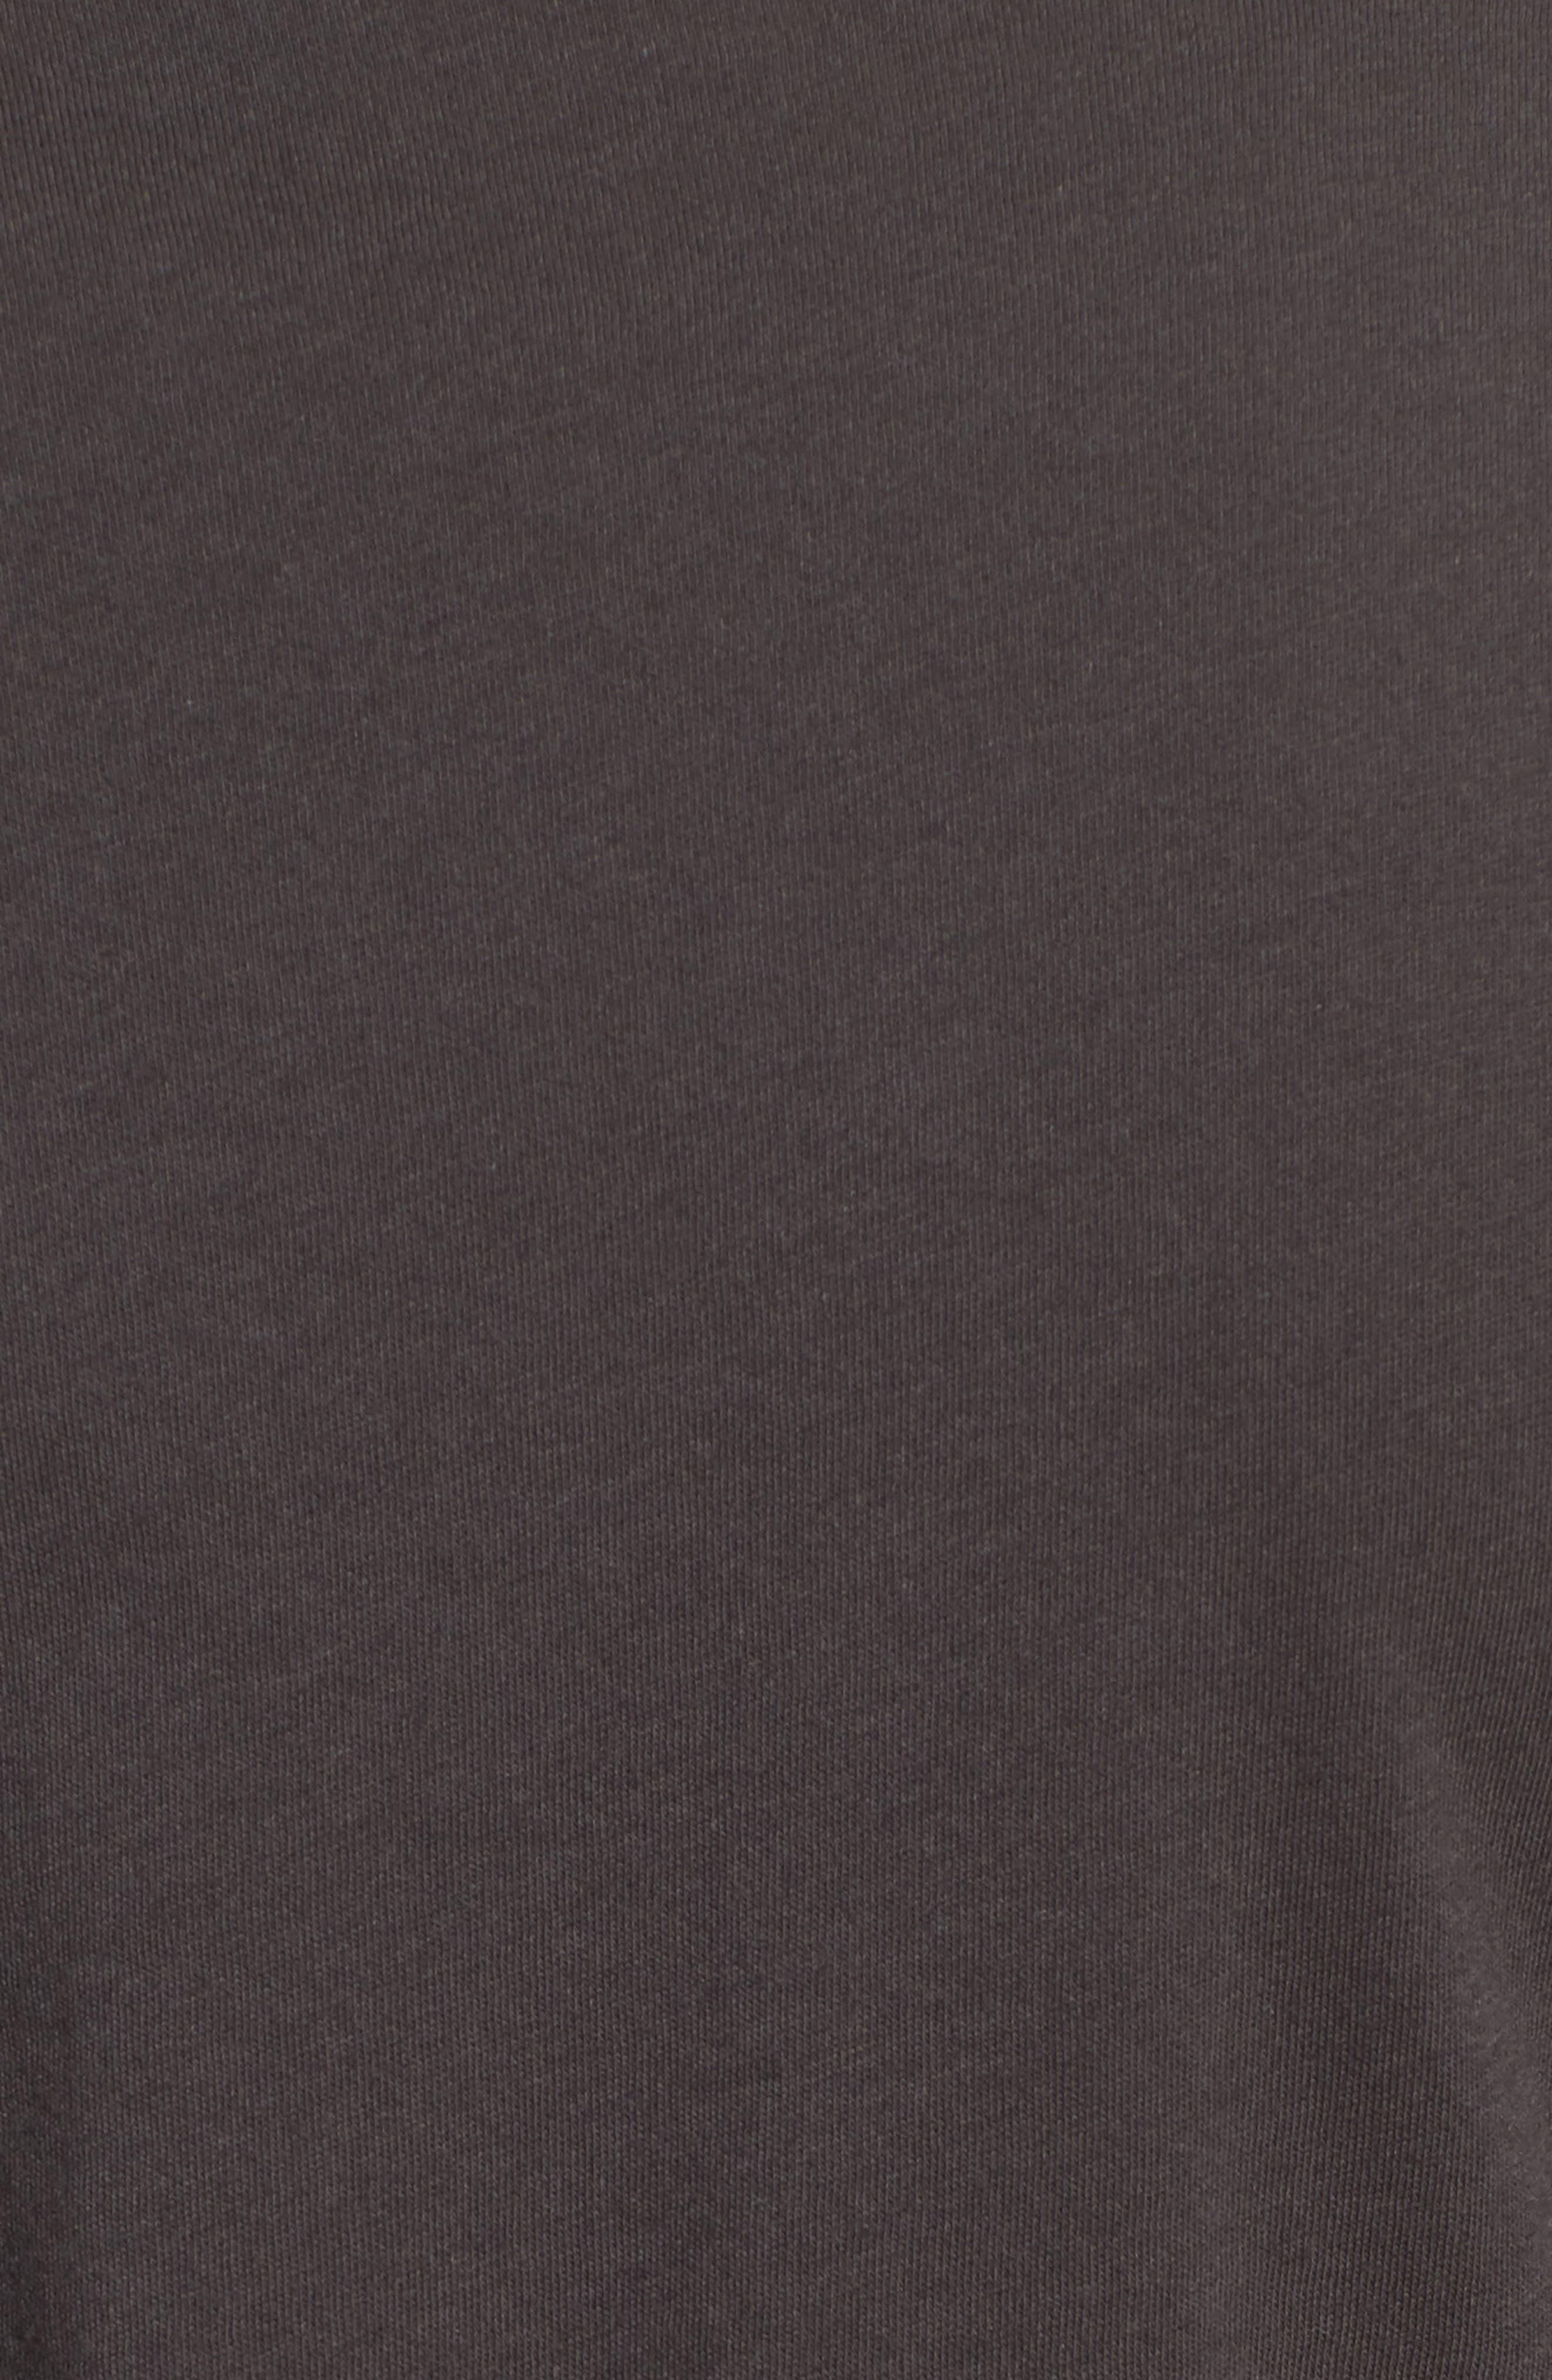 Pintuck Sleeve Cotton Blouse,                             Alternate thumbnail 6, color,                             010